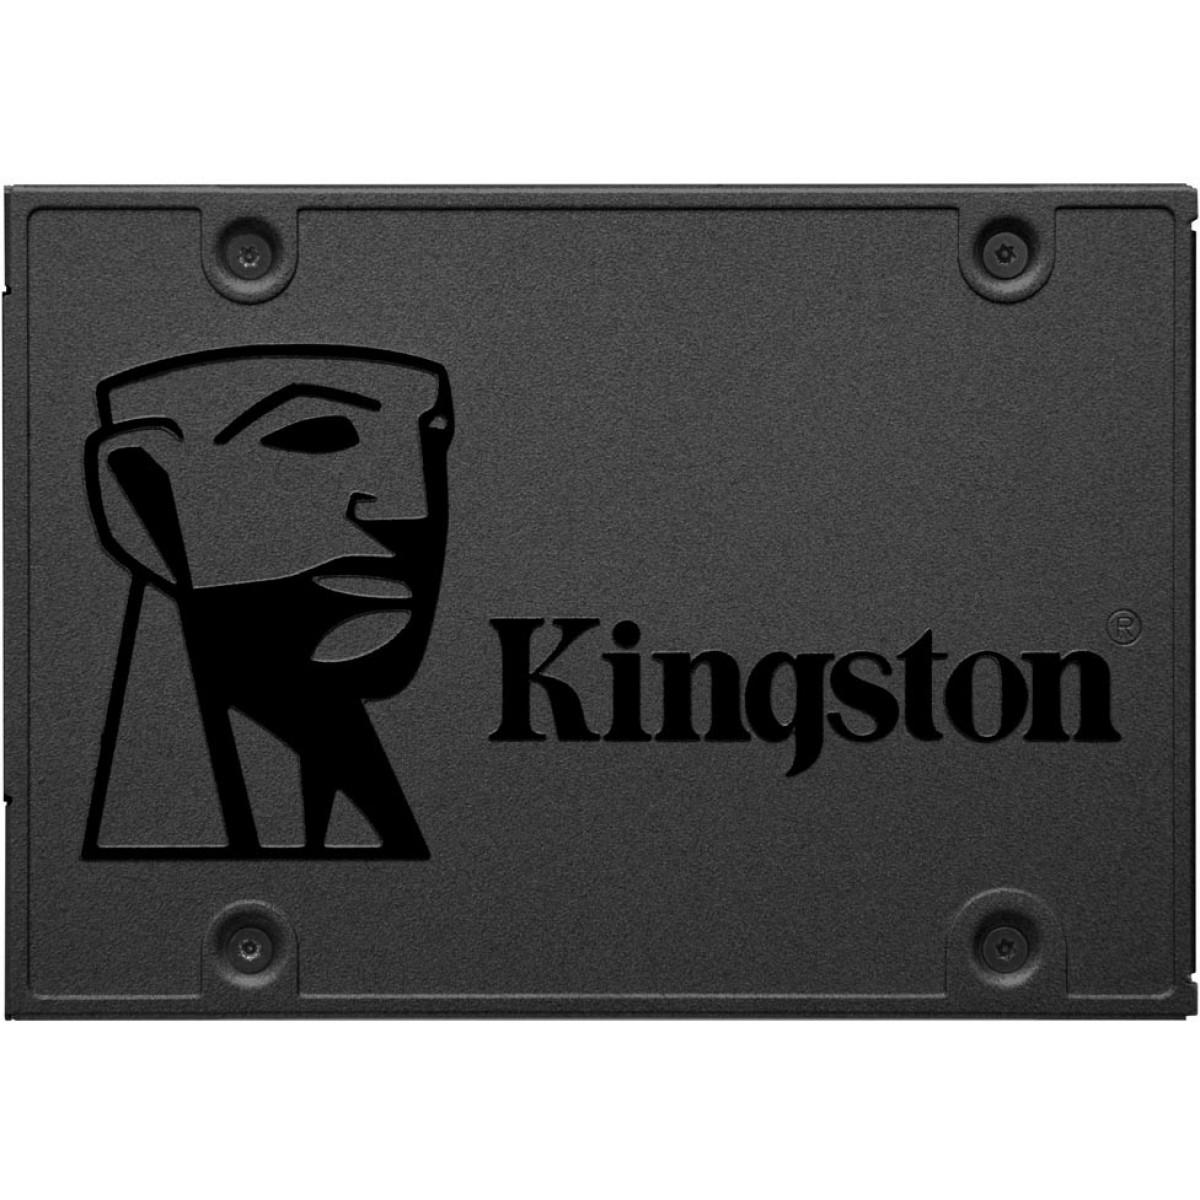 SSD Kingston A400, 120GB, Sata III, Leitura 500MBs Gravação 320MBs, SA400S37/120G